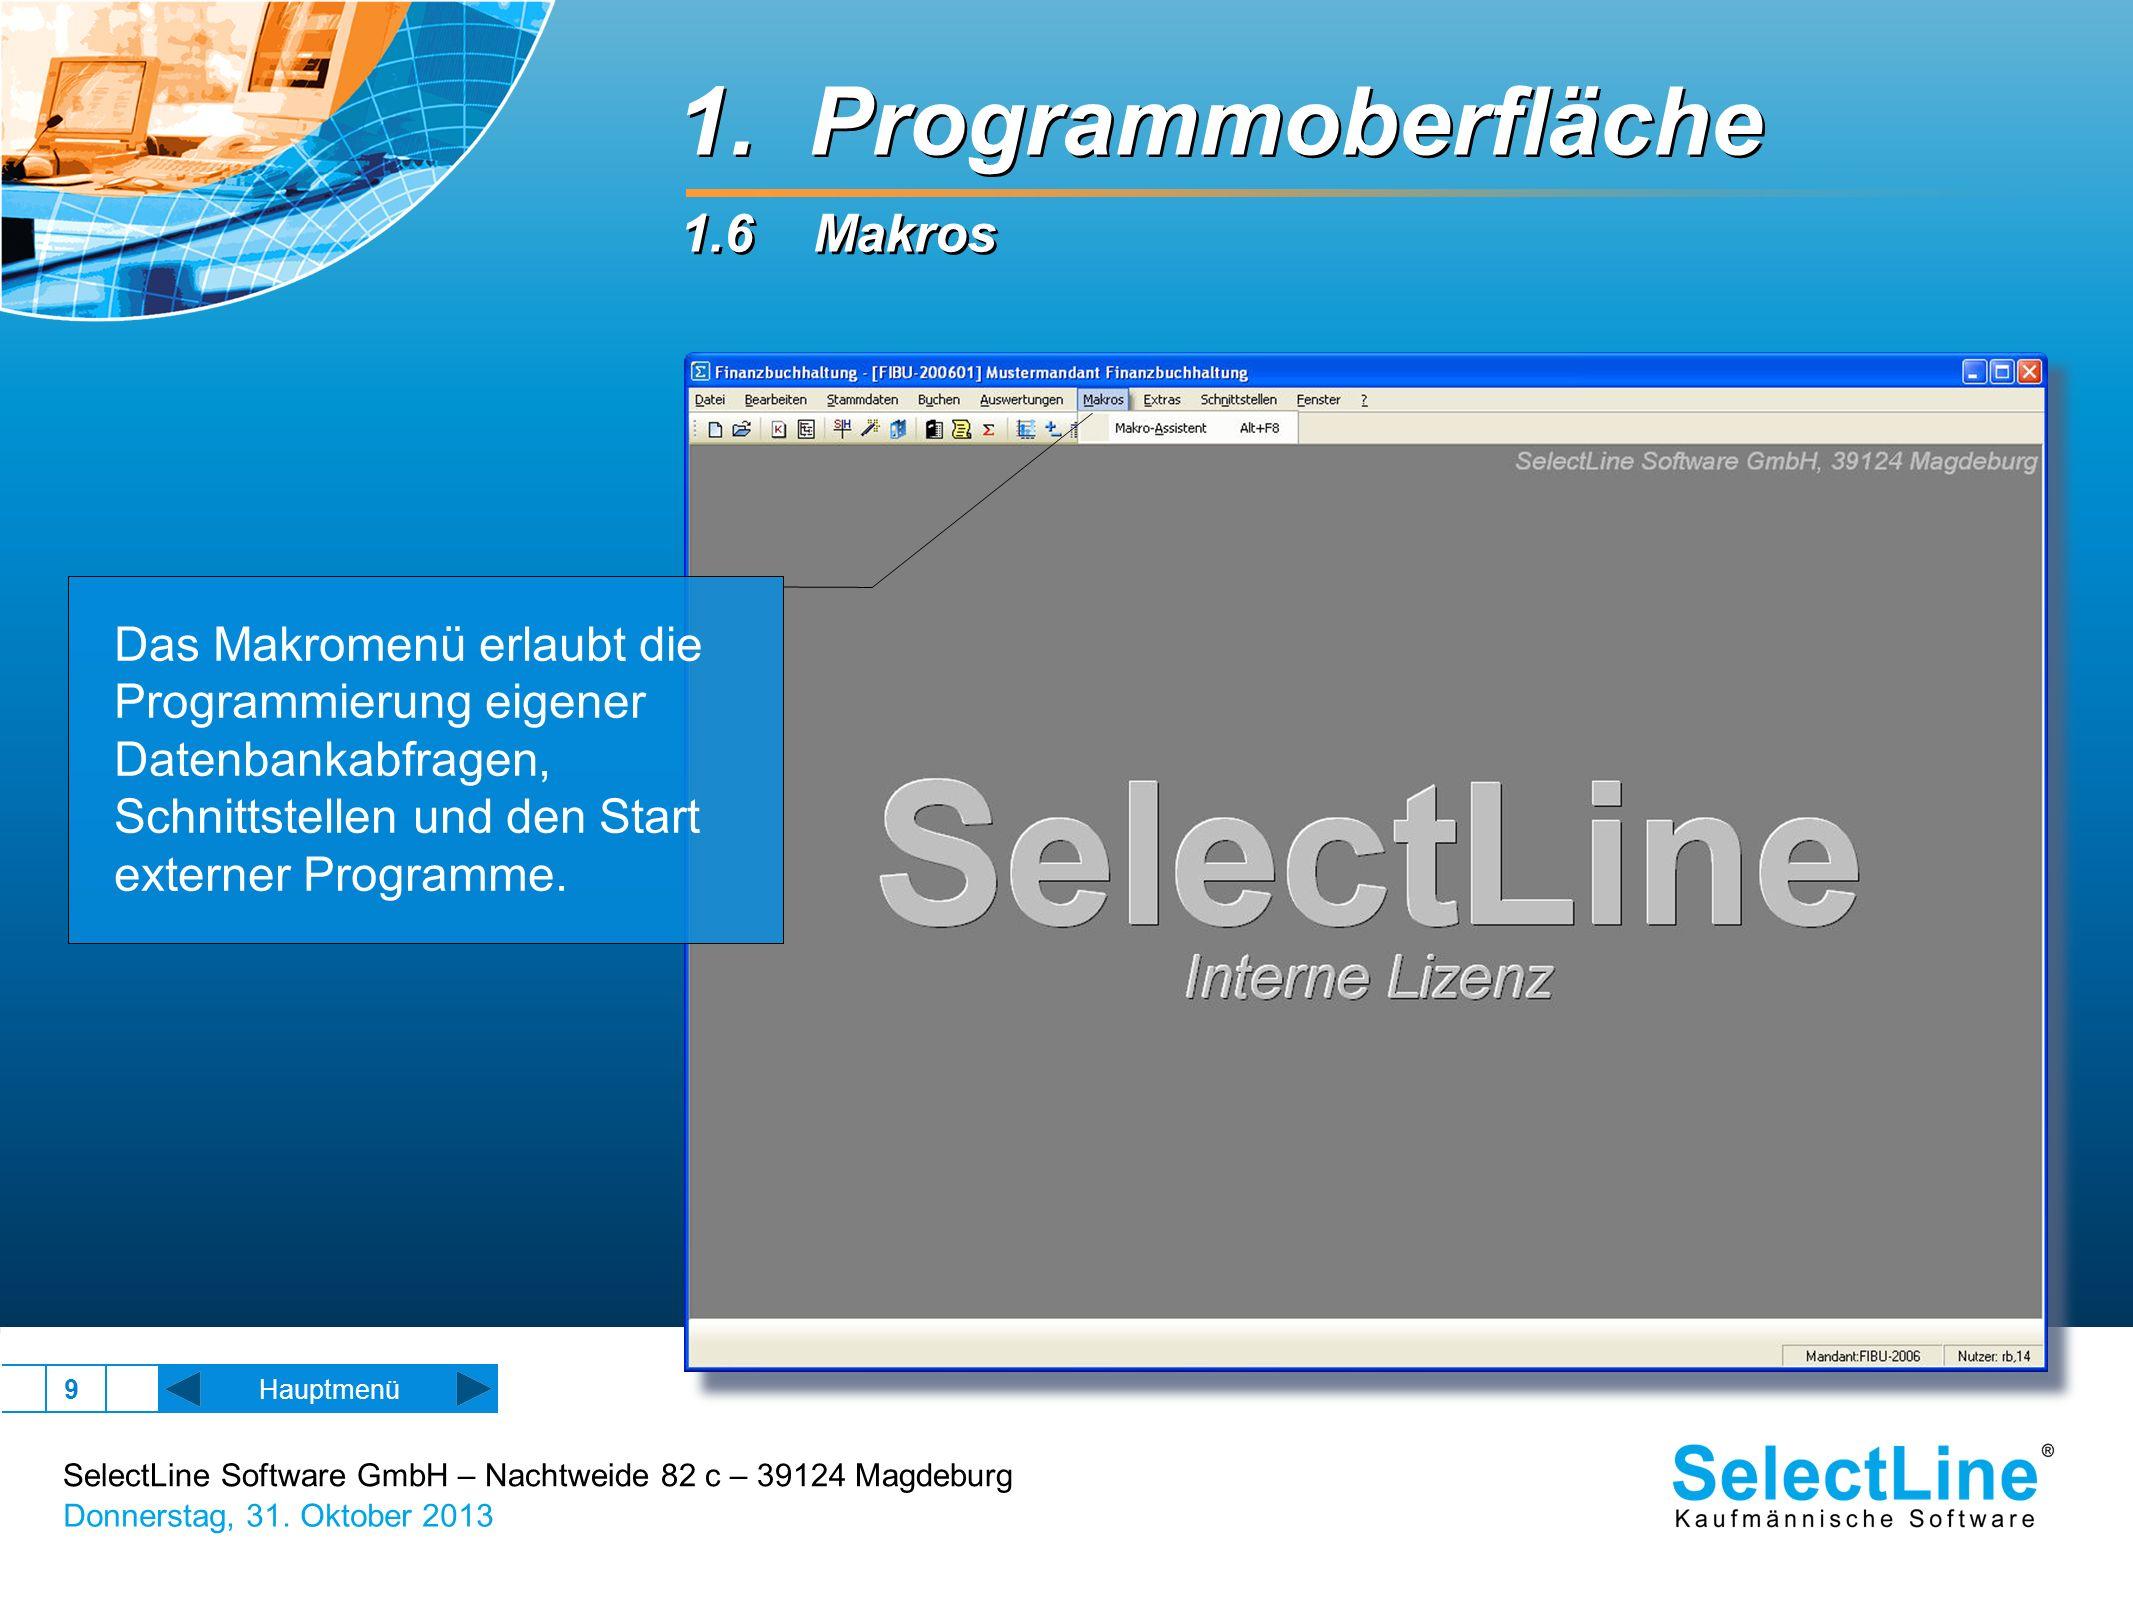 1. Programmoberfläche 1.6 Makros